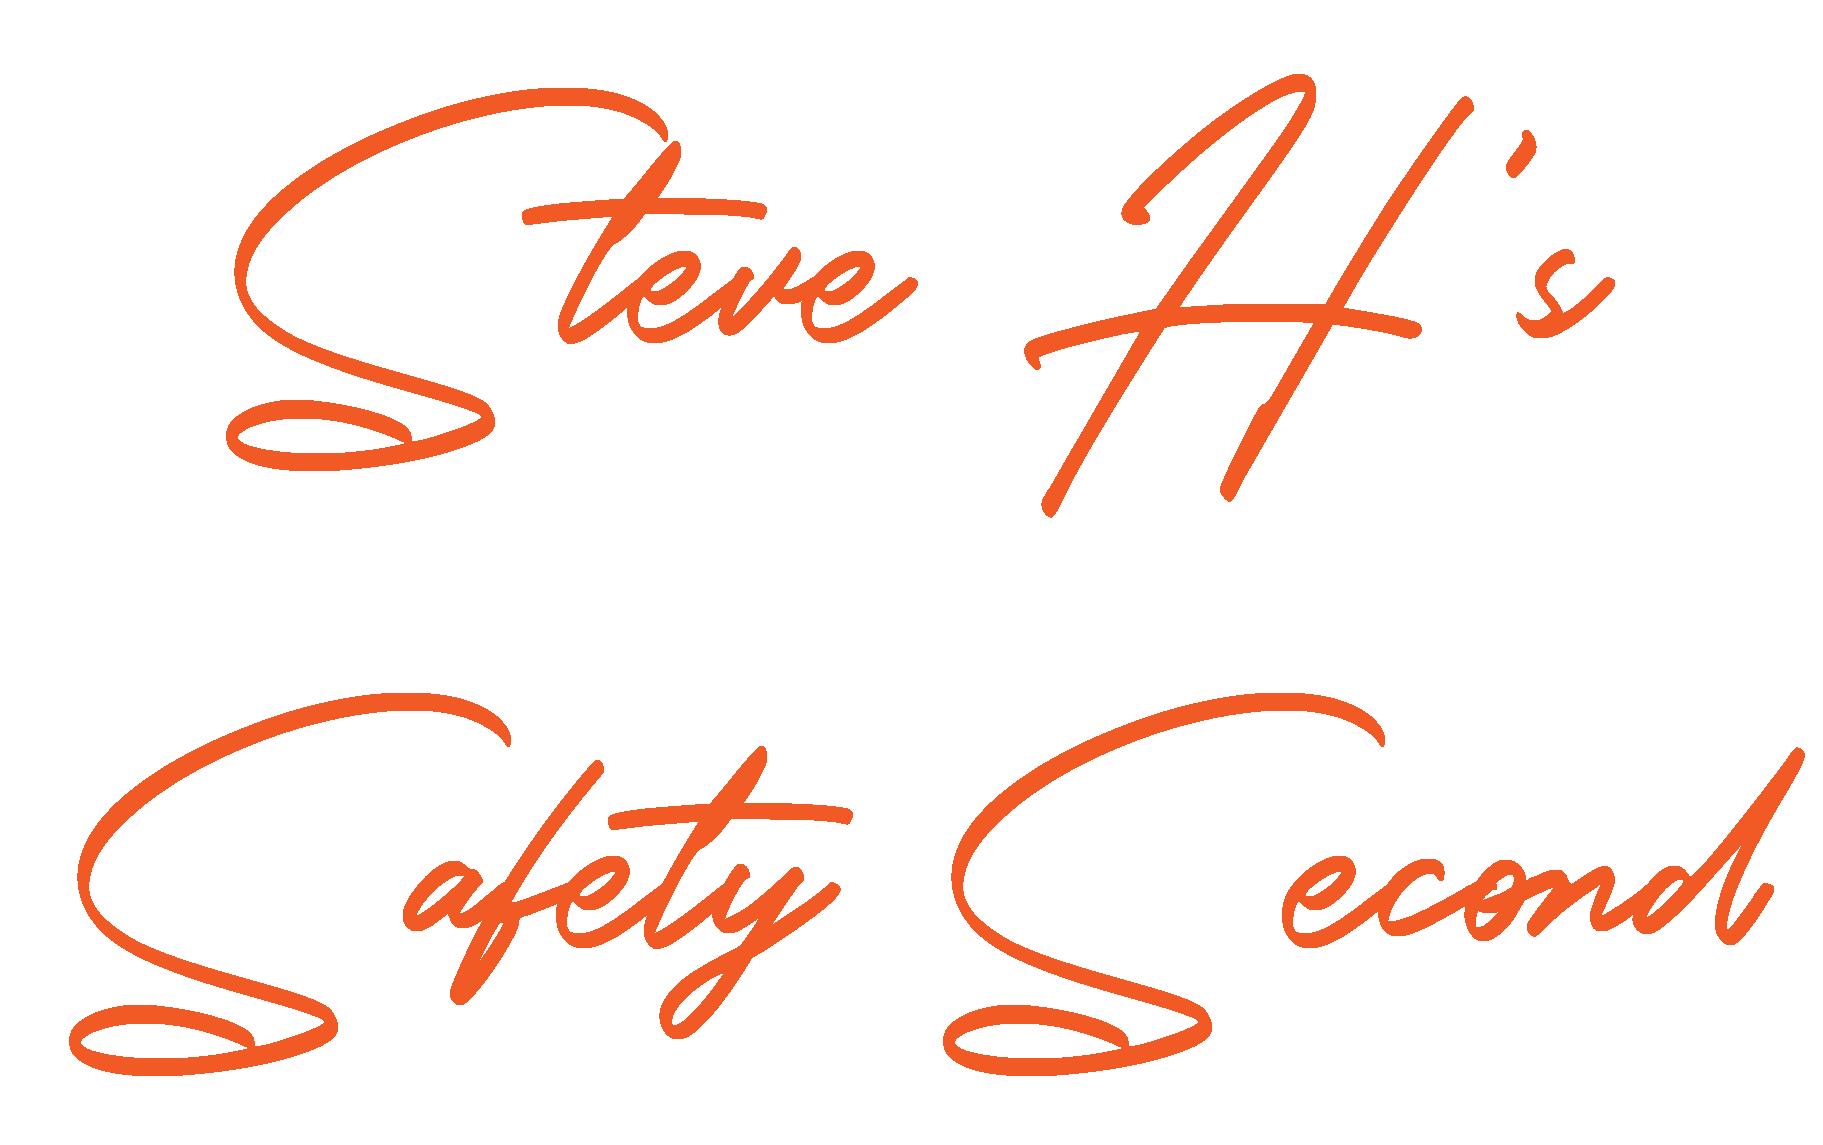 Populist Safety Second